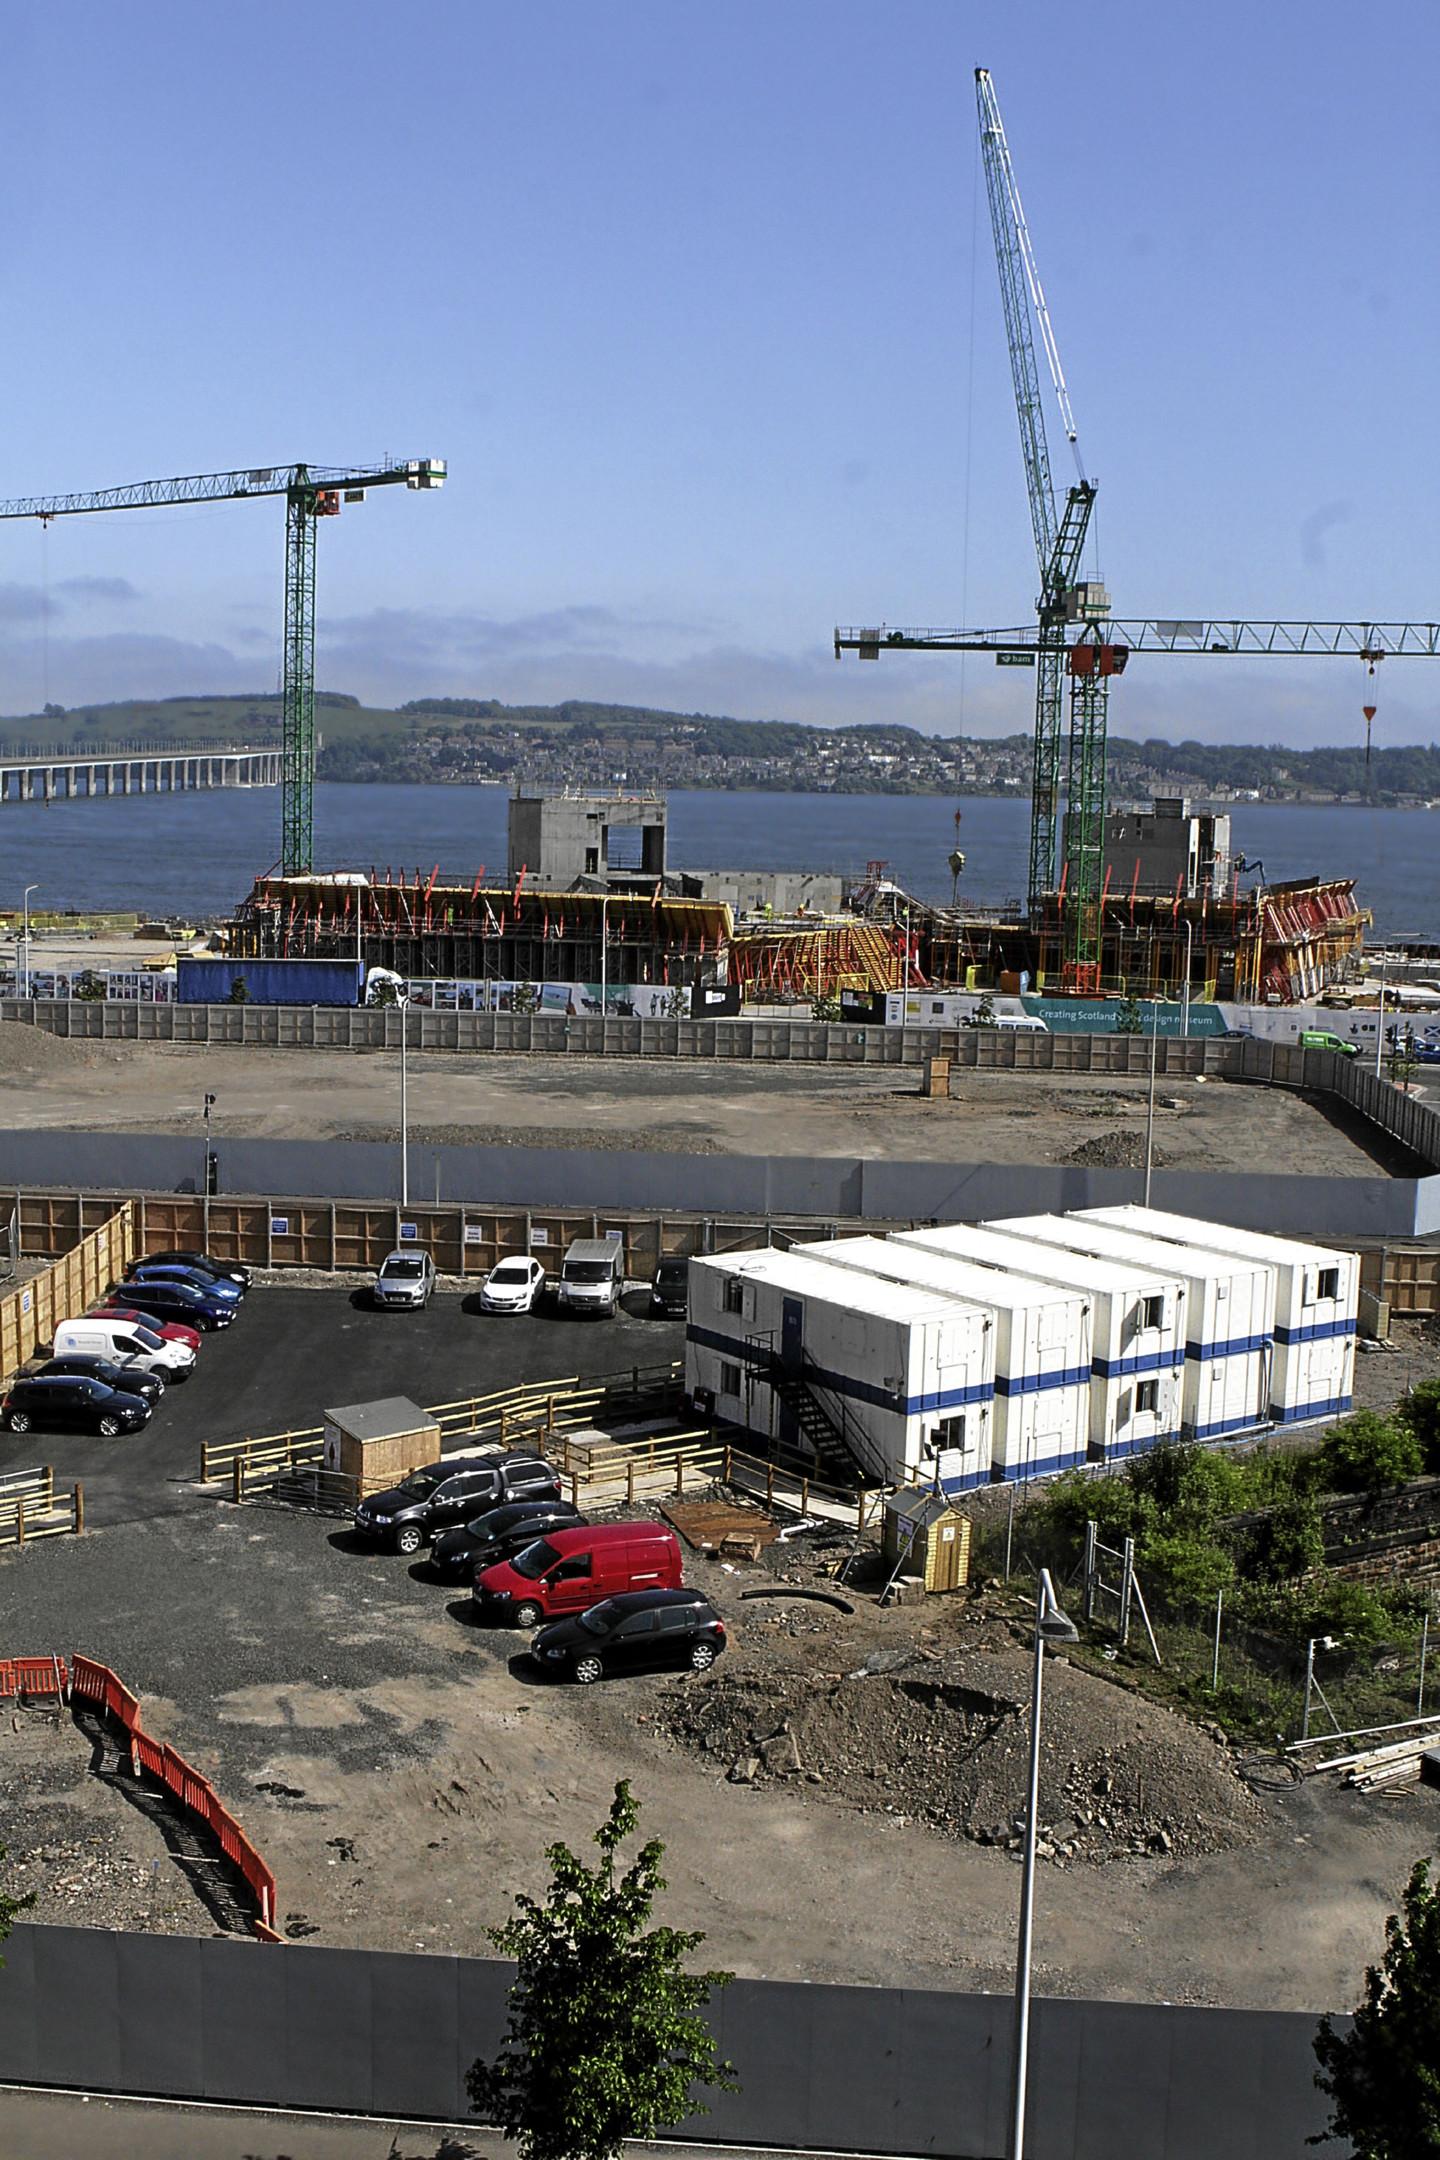 The Waterfront development